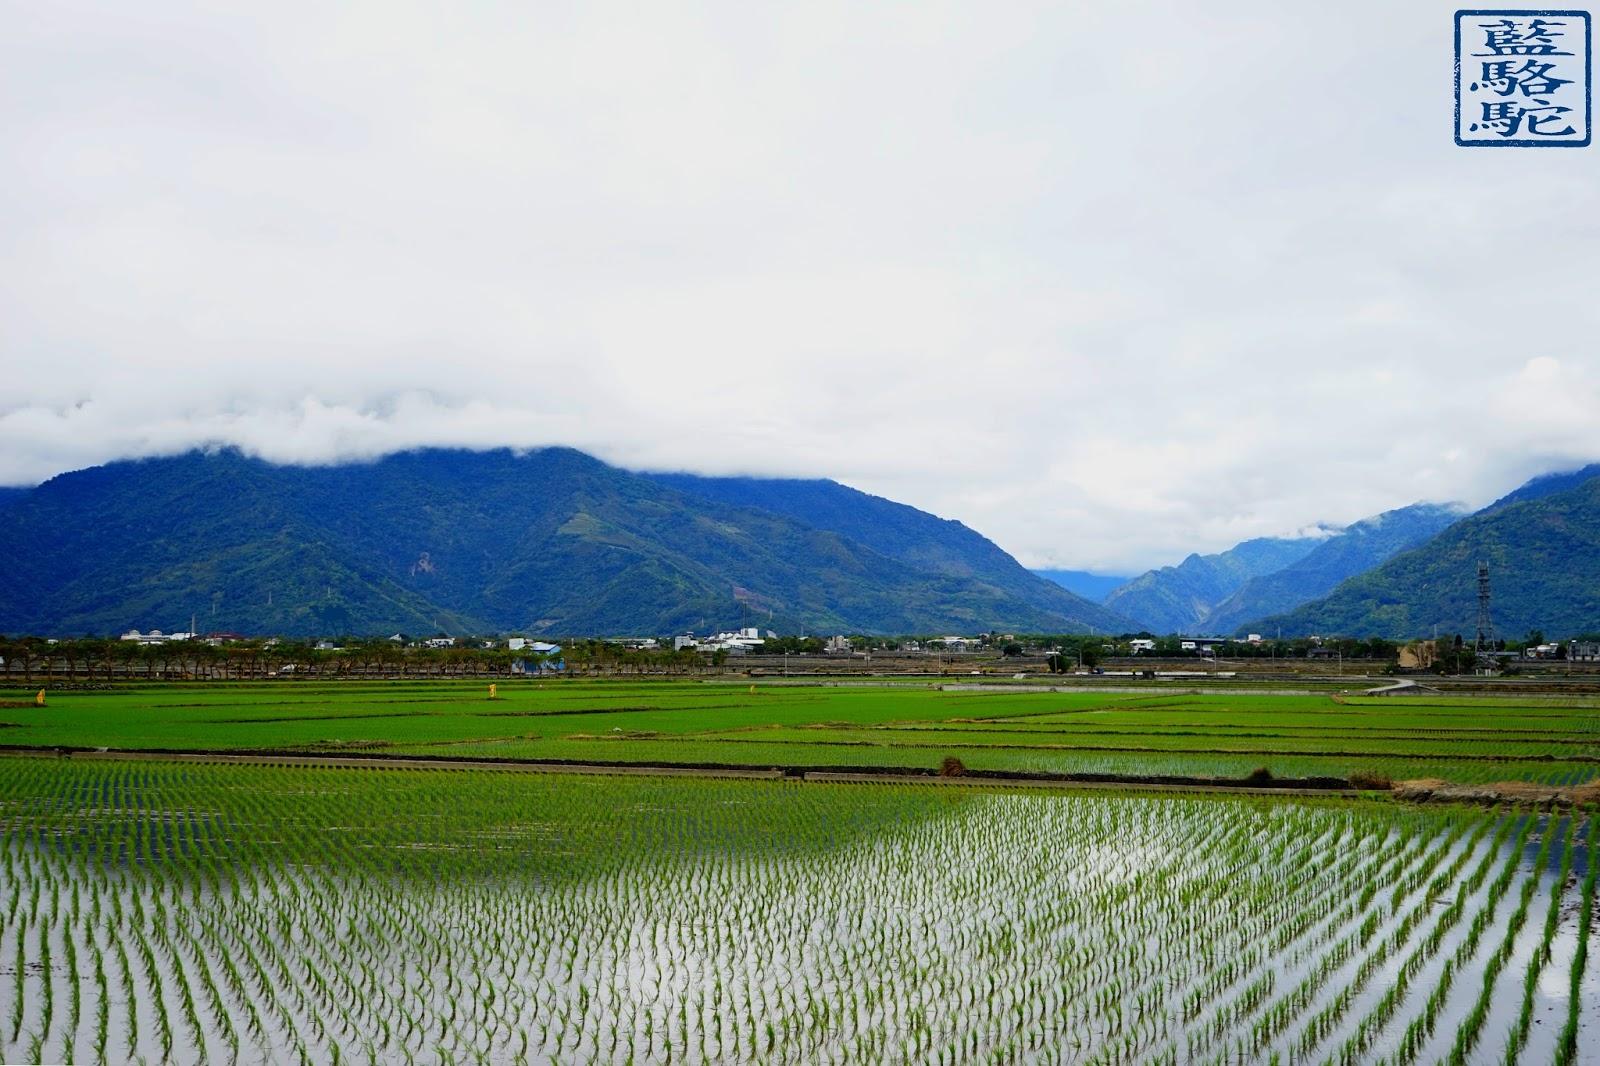 Le Chameau Bleu - Shichang vu des rizieres- rando velo route taiwan